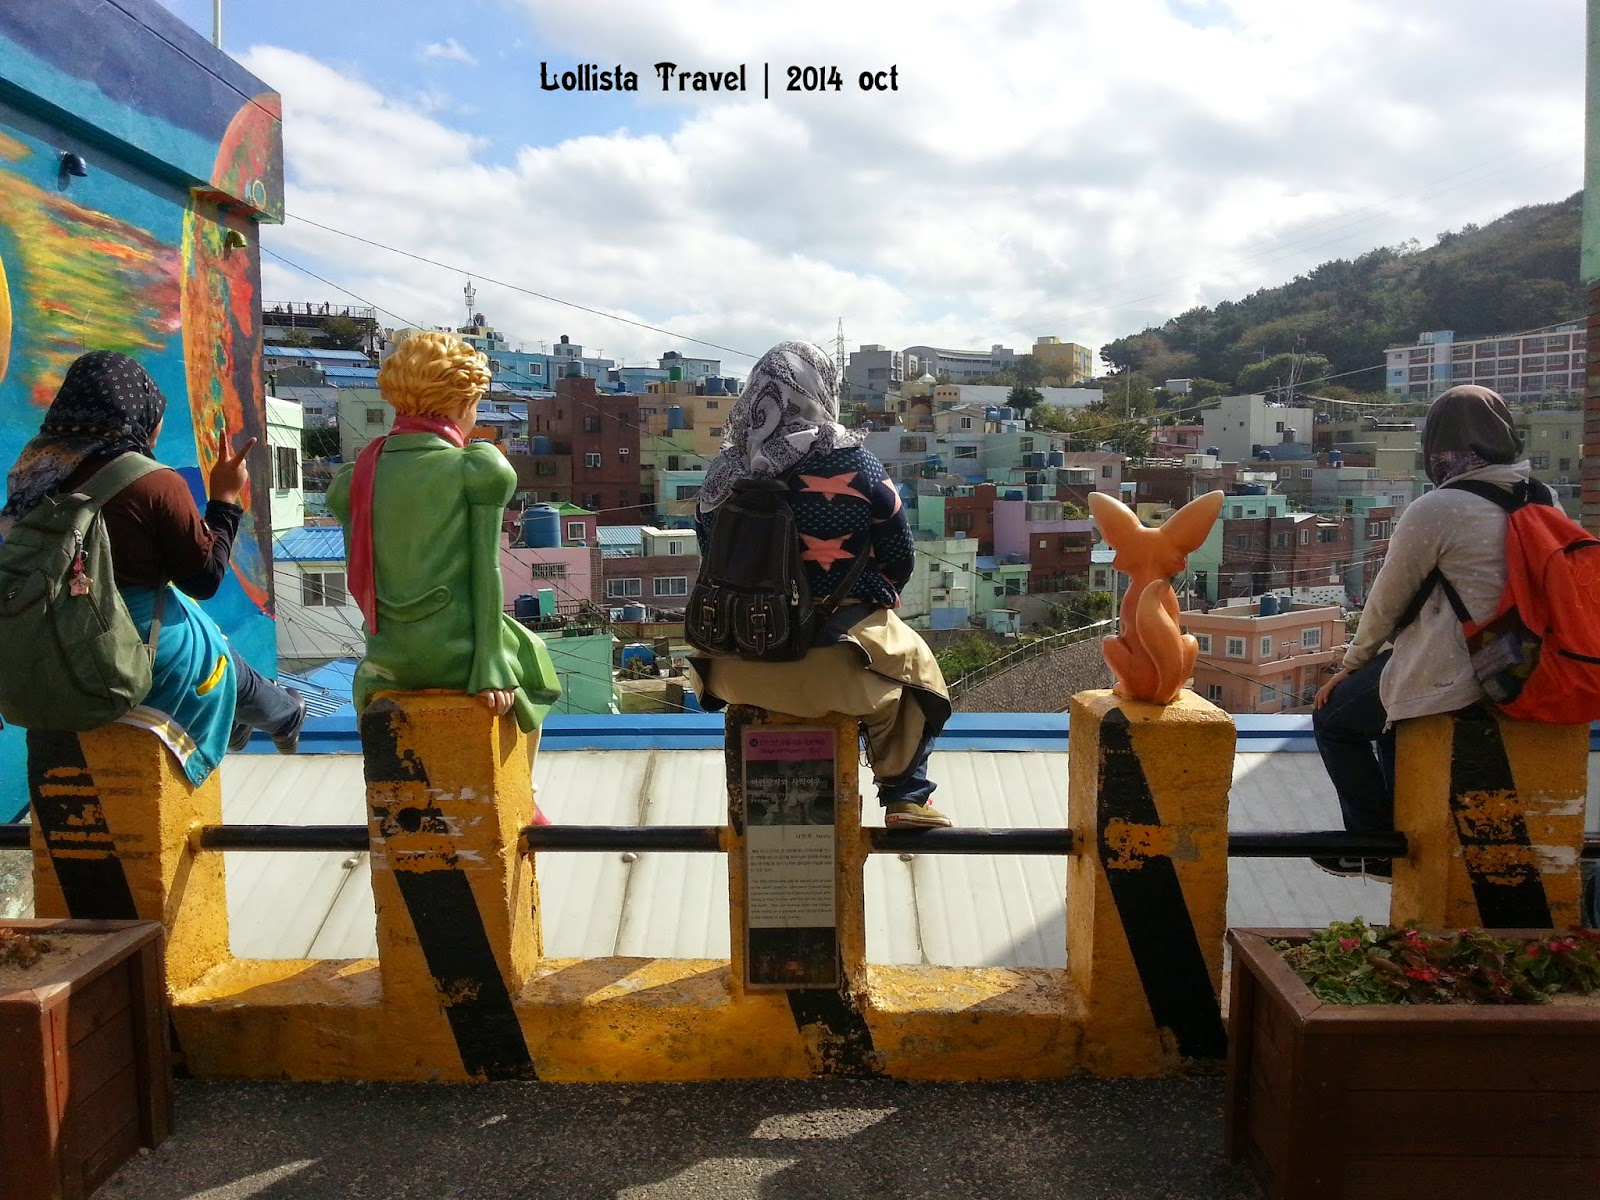 lollista.blogspot.com